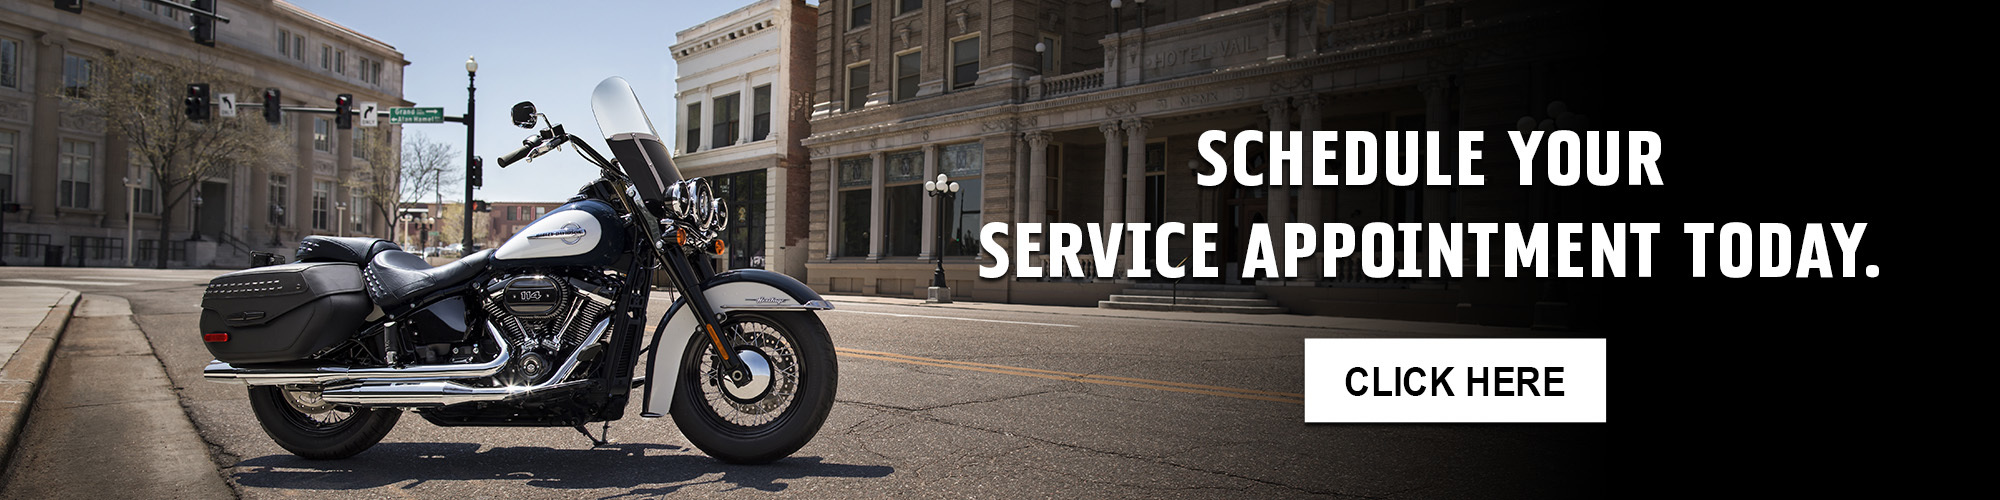 Schedule Your Service at Mineshaft Harley-Davidson